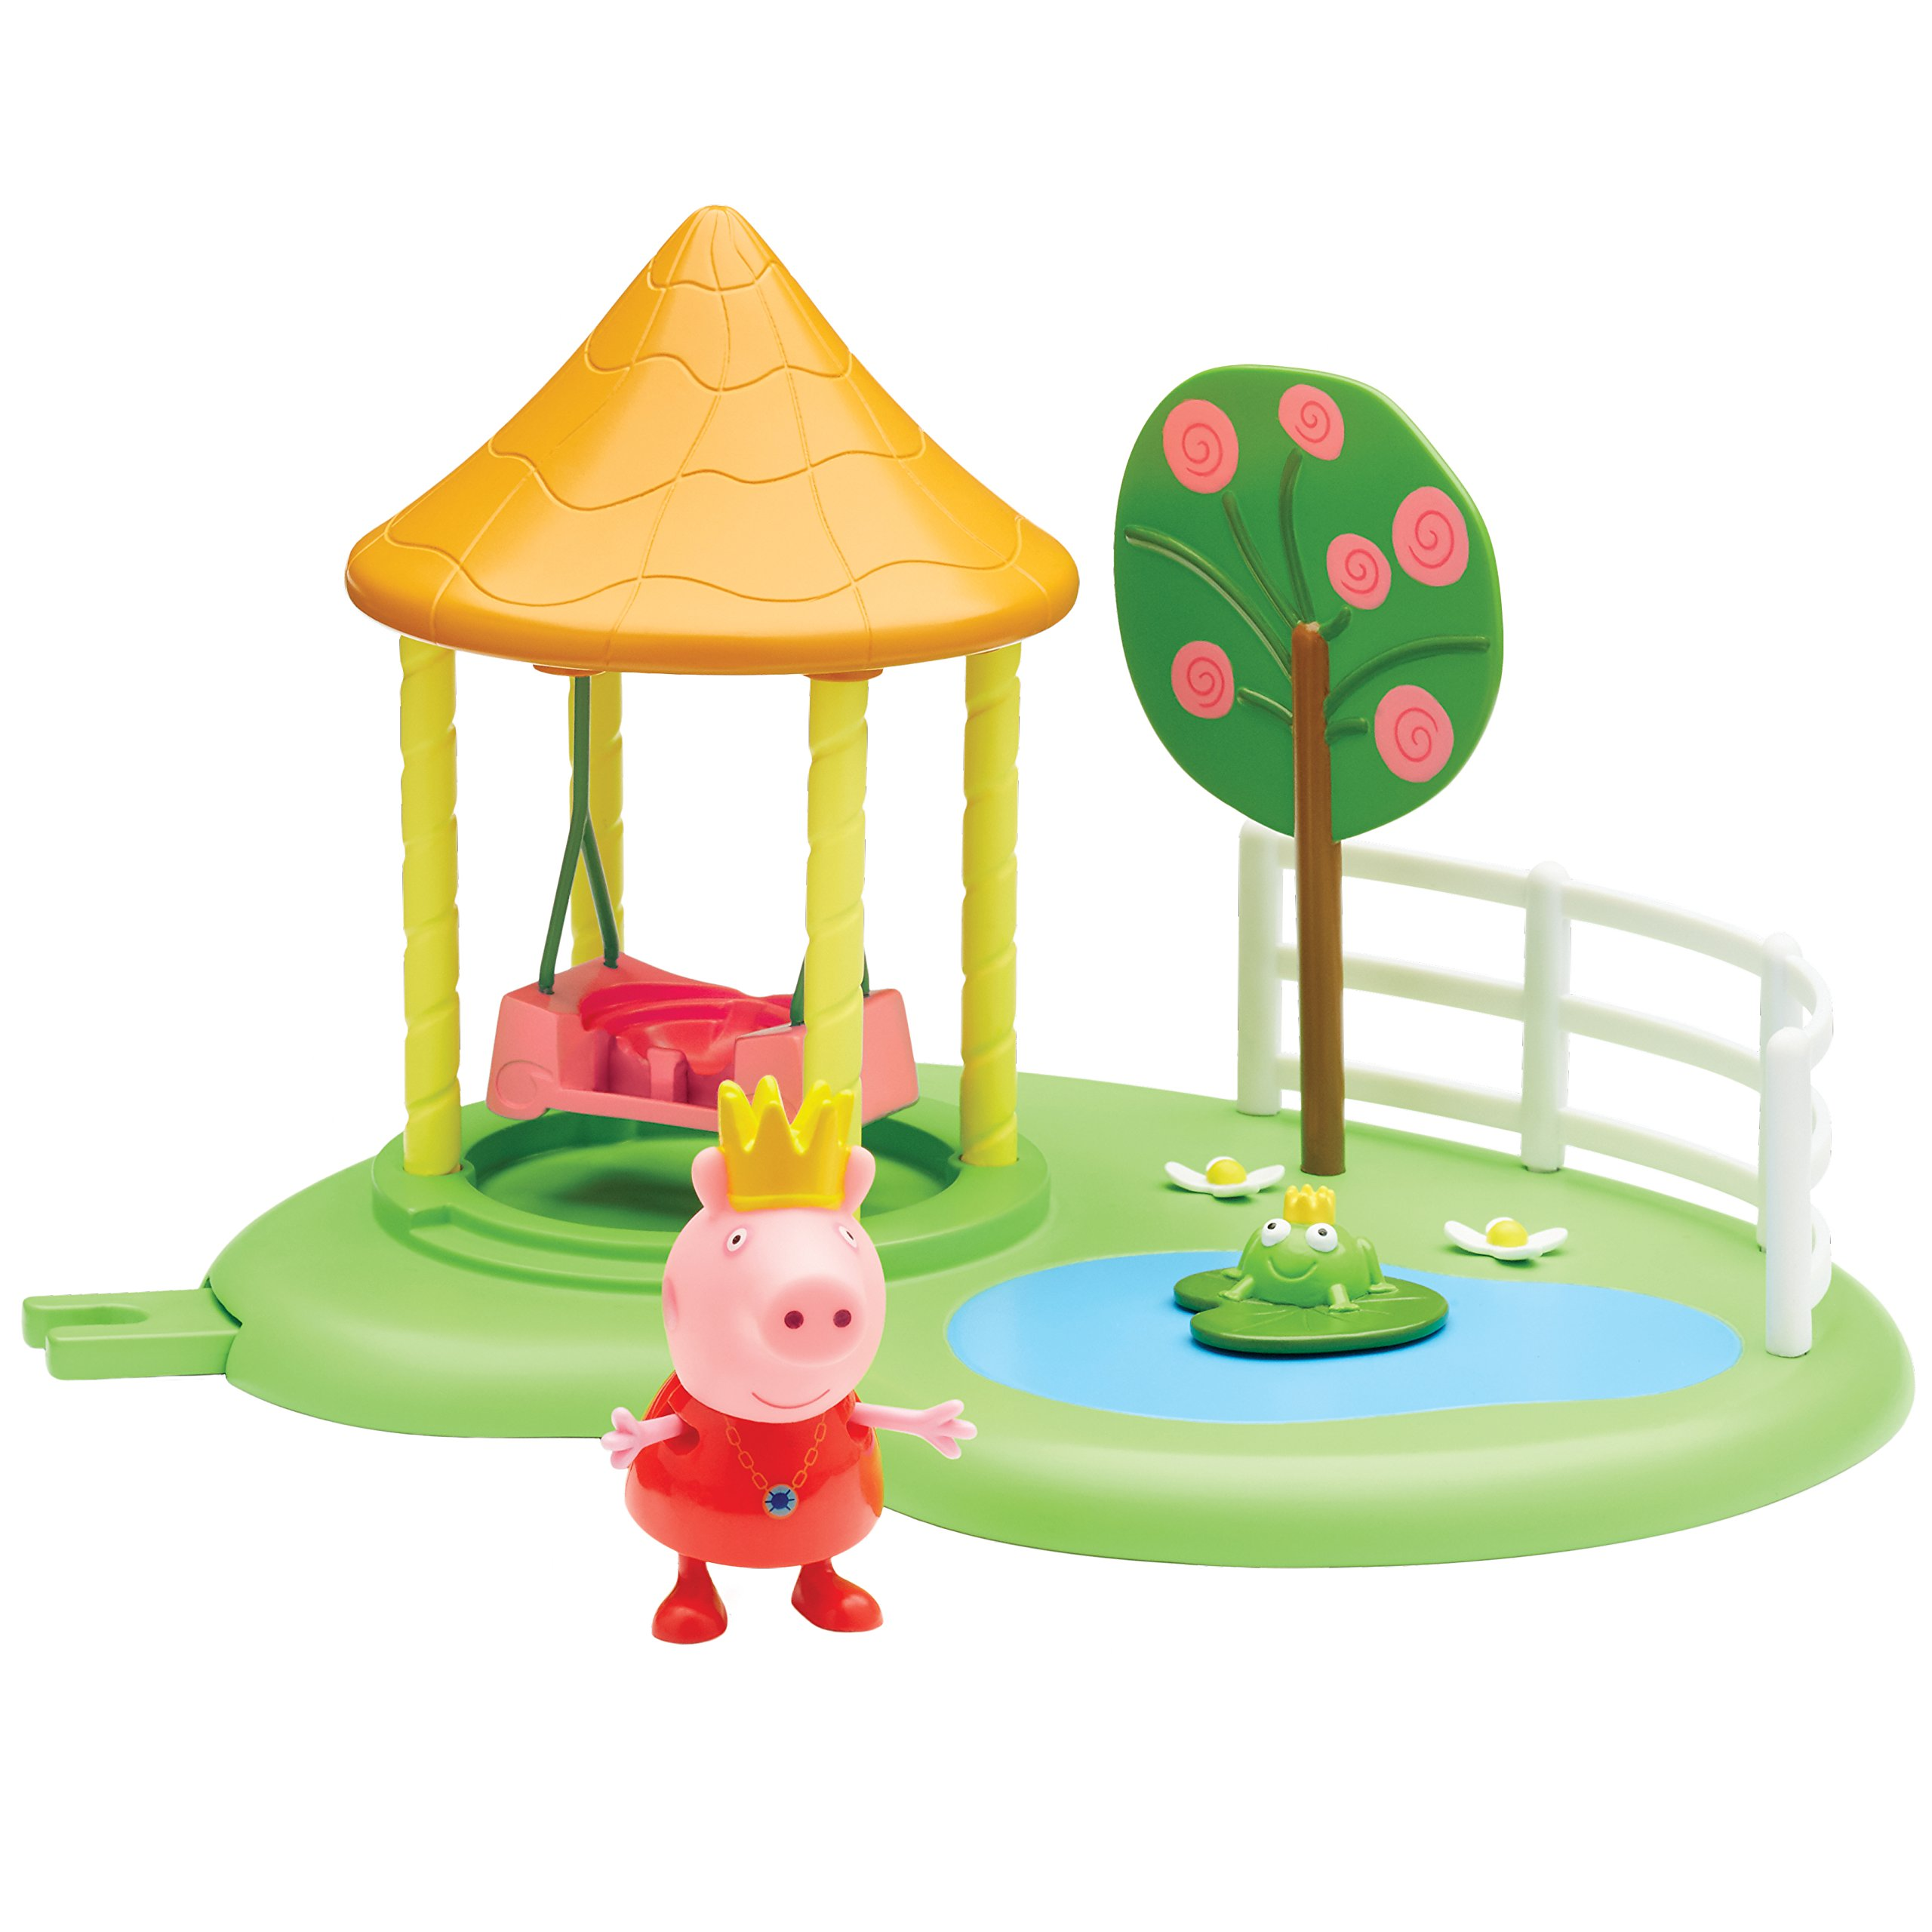 Peppa Pig 06249